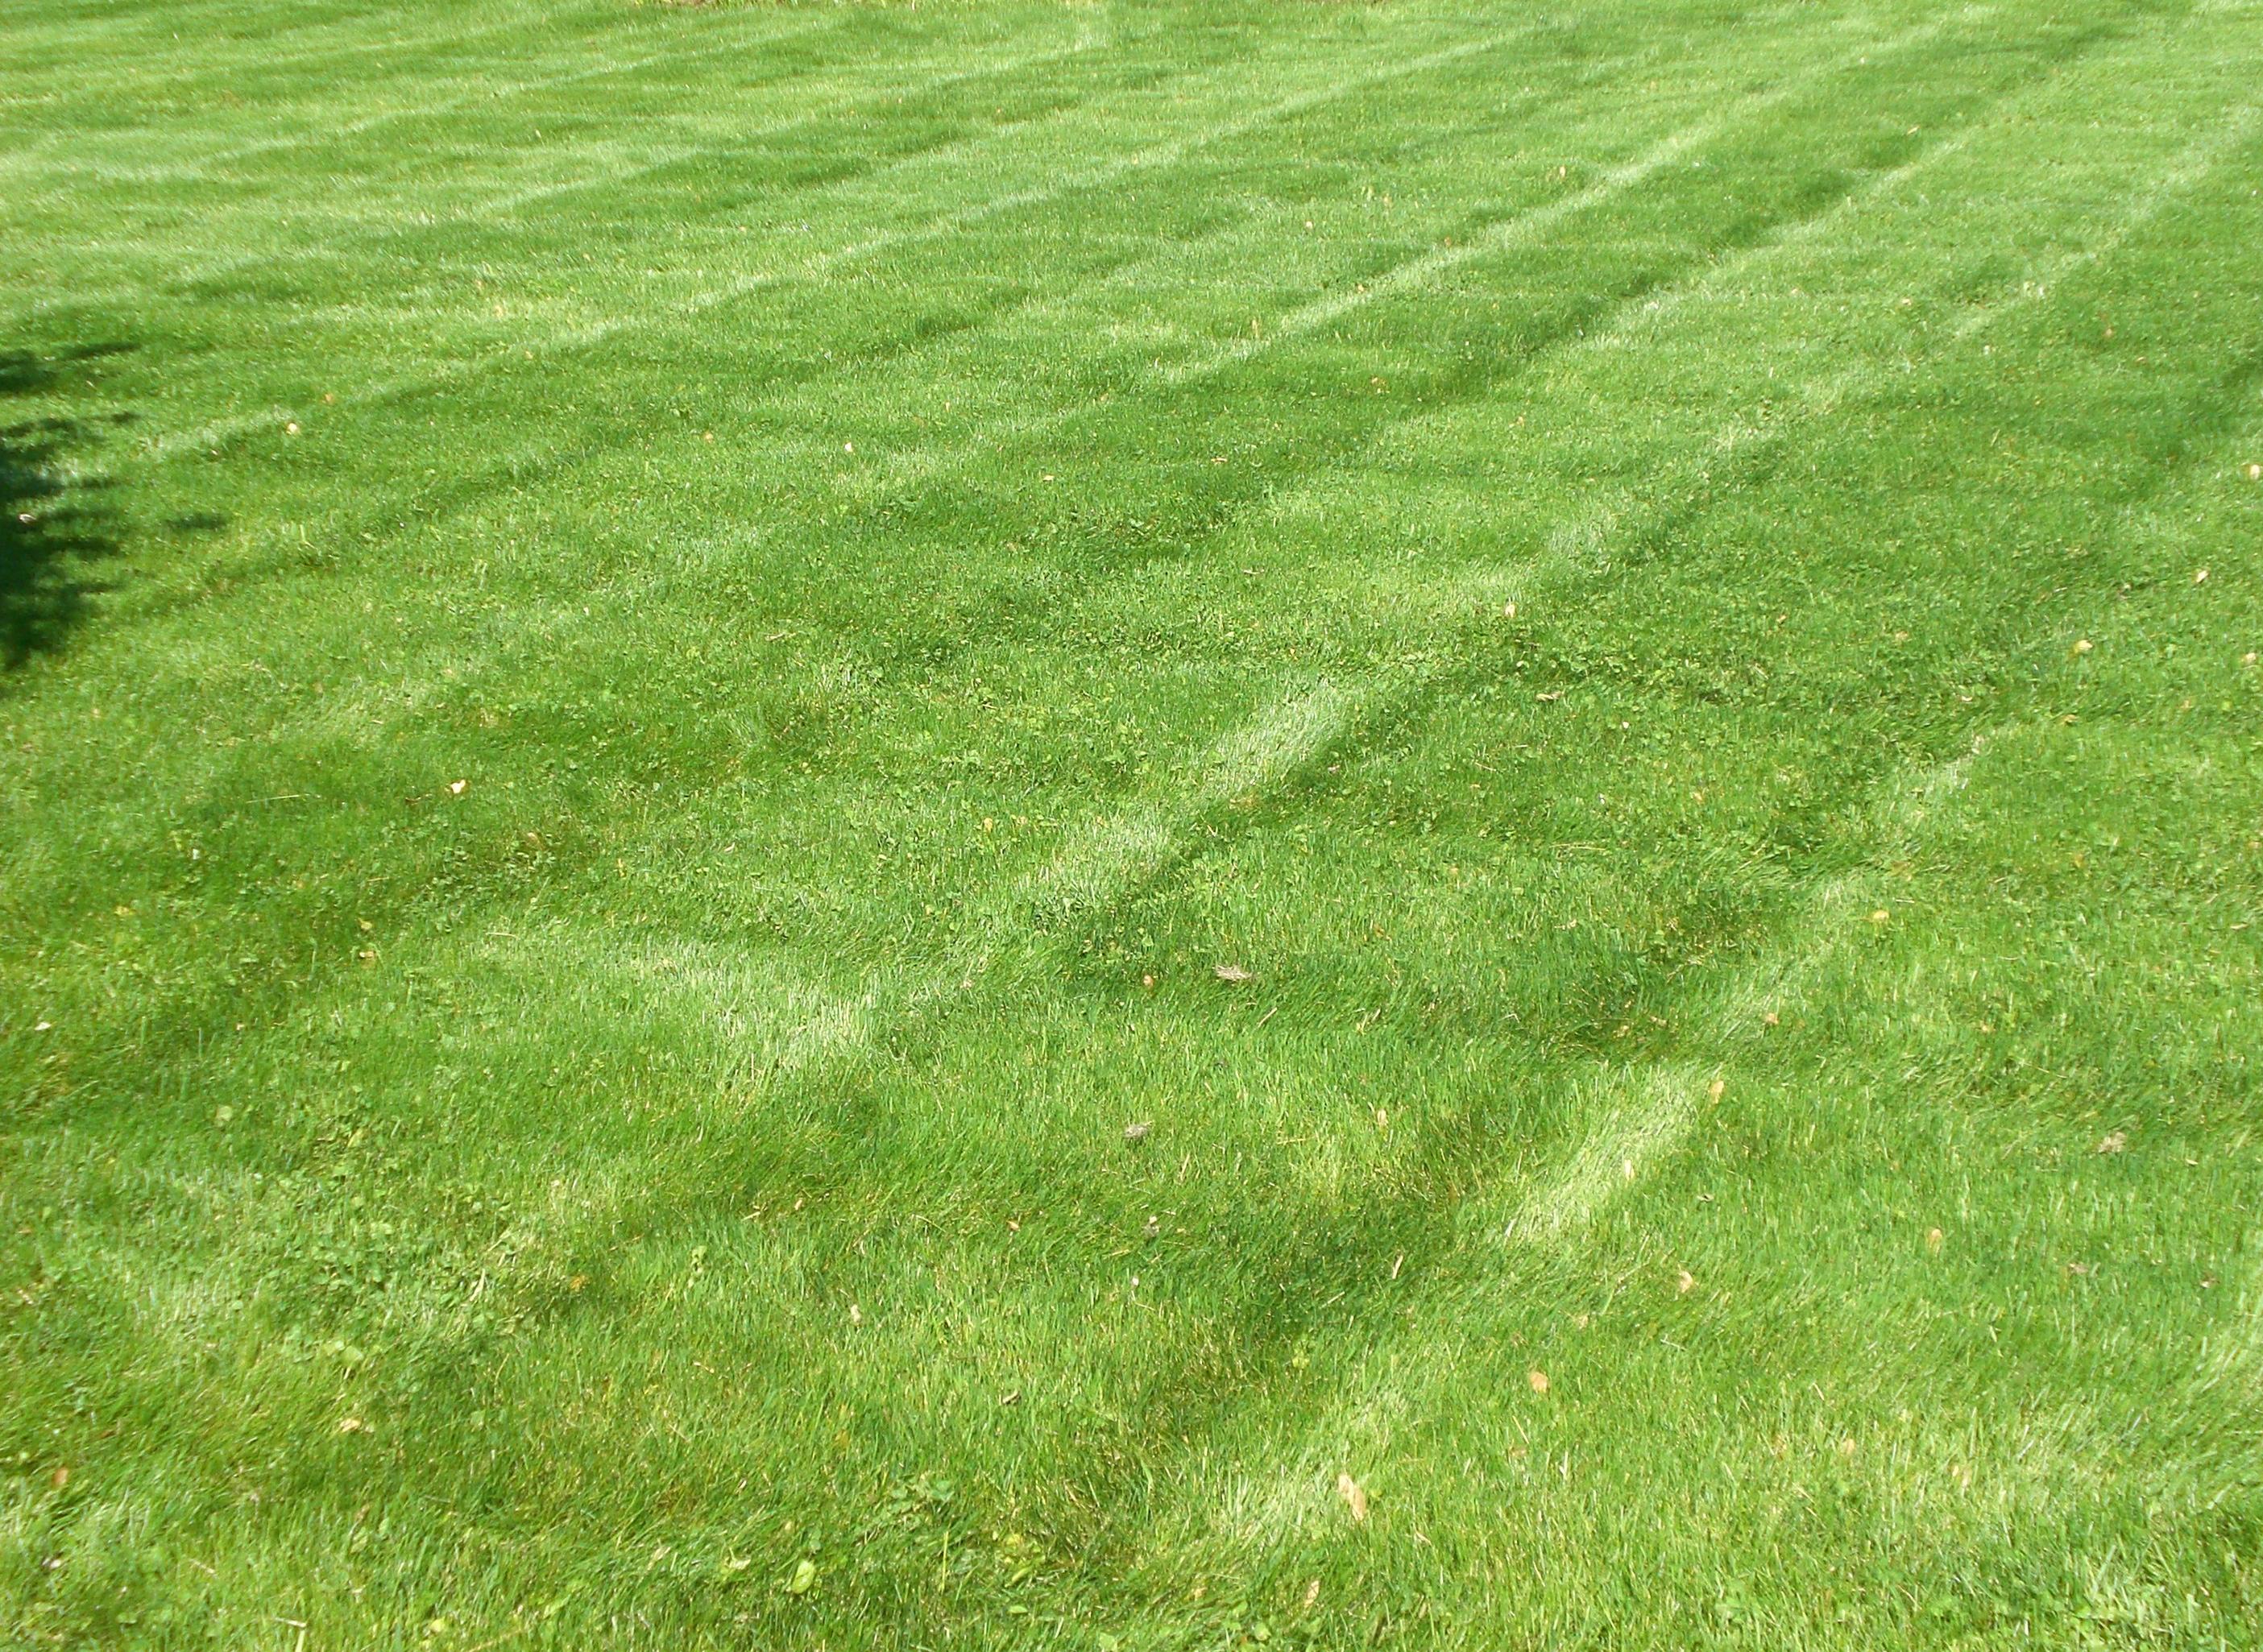 Landscaping Grass Pics : File stripedlawn g wikipedia